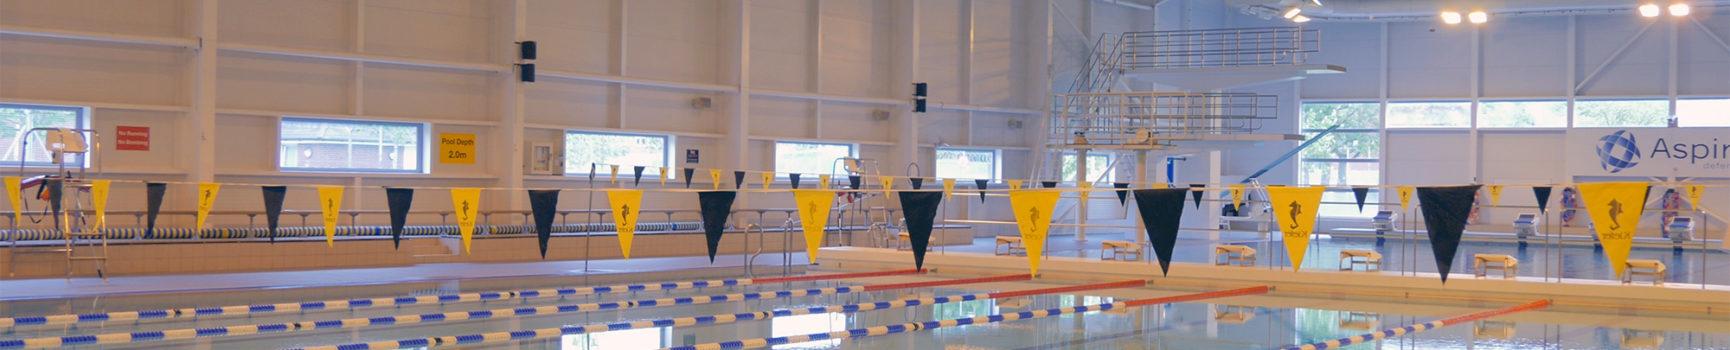 Pool timetable aspire defence services limited for Aldershot swimming pool burlington